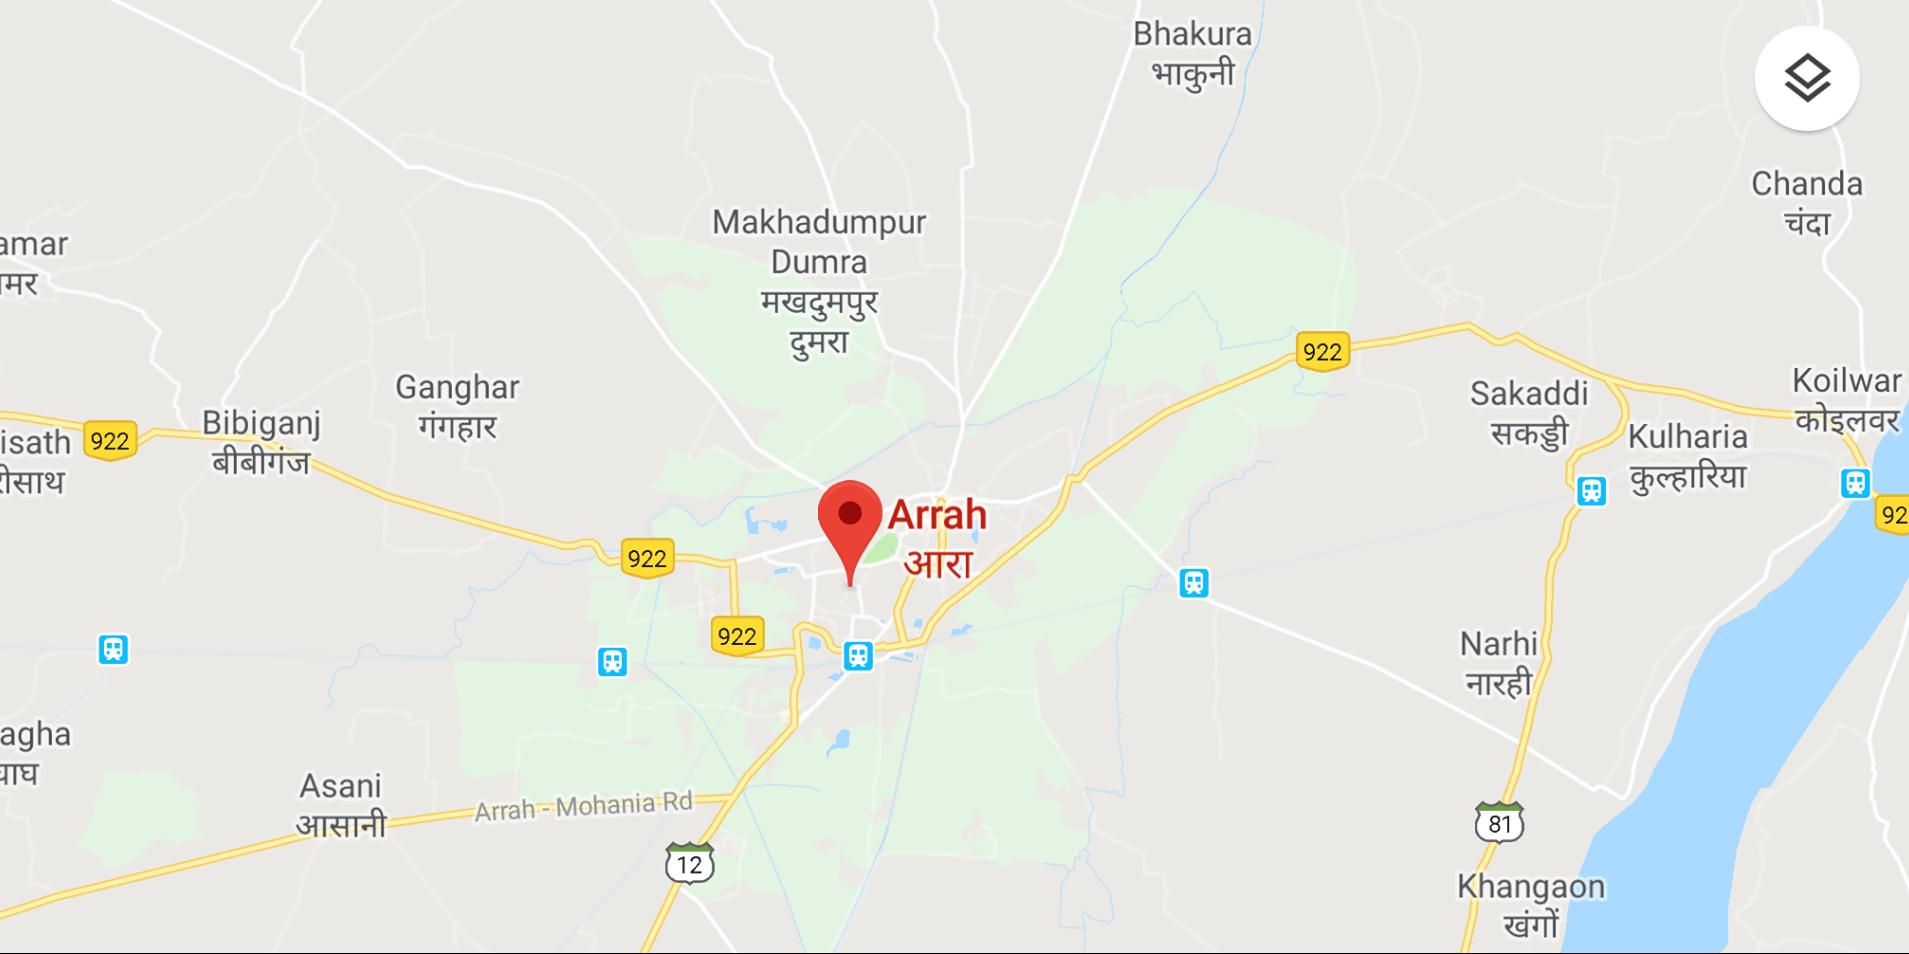 Arrah-e1548148052994